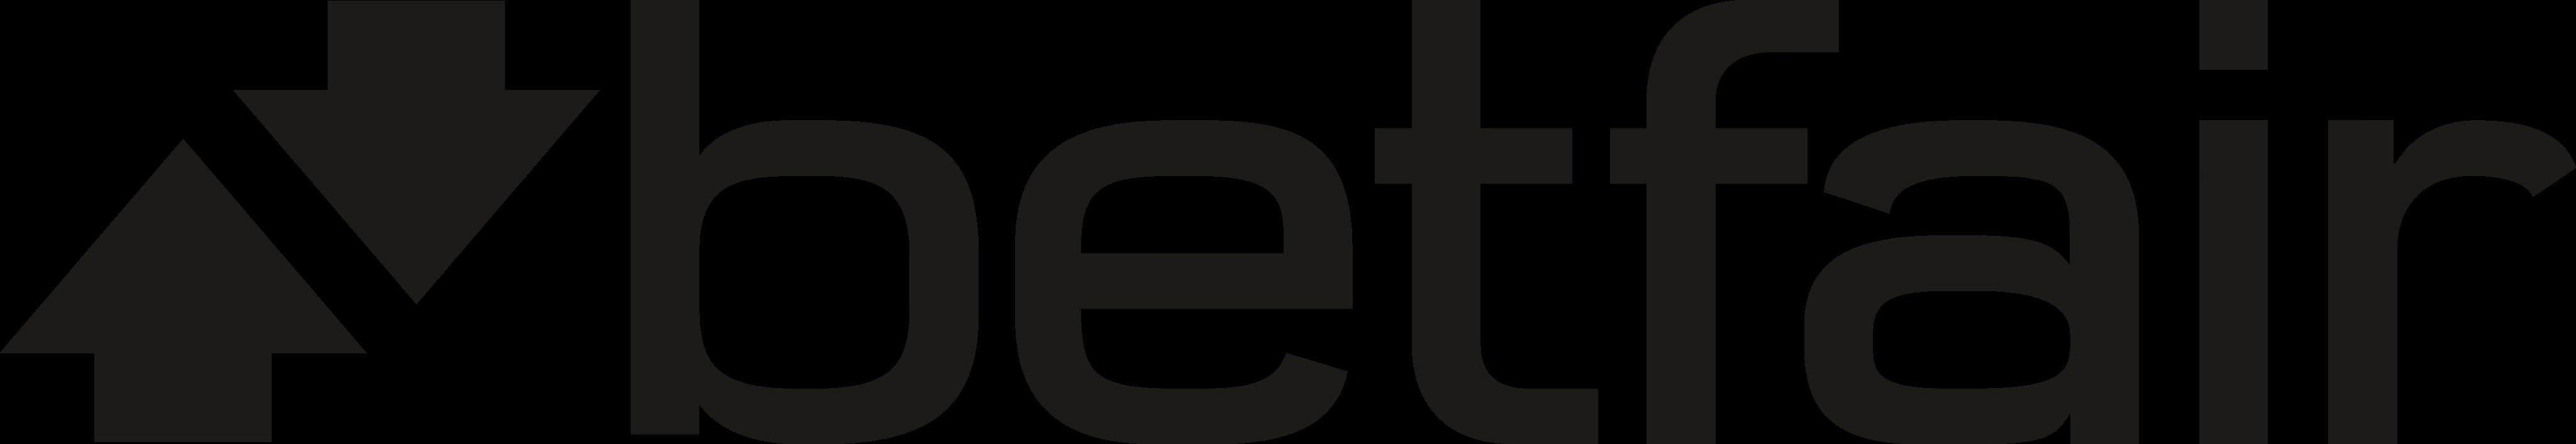 betfair logo 1 - Betfair Logo